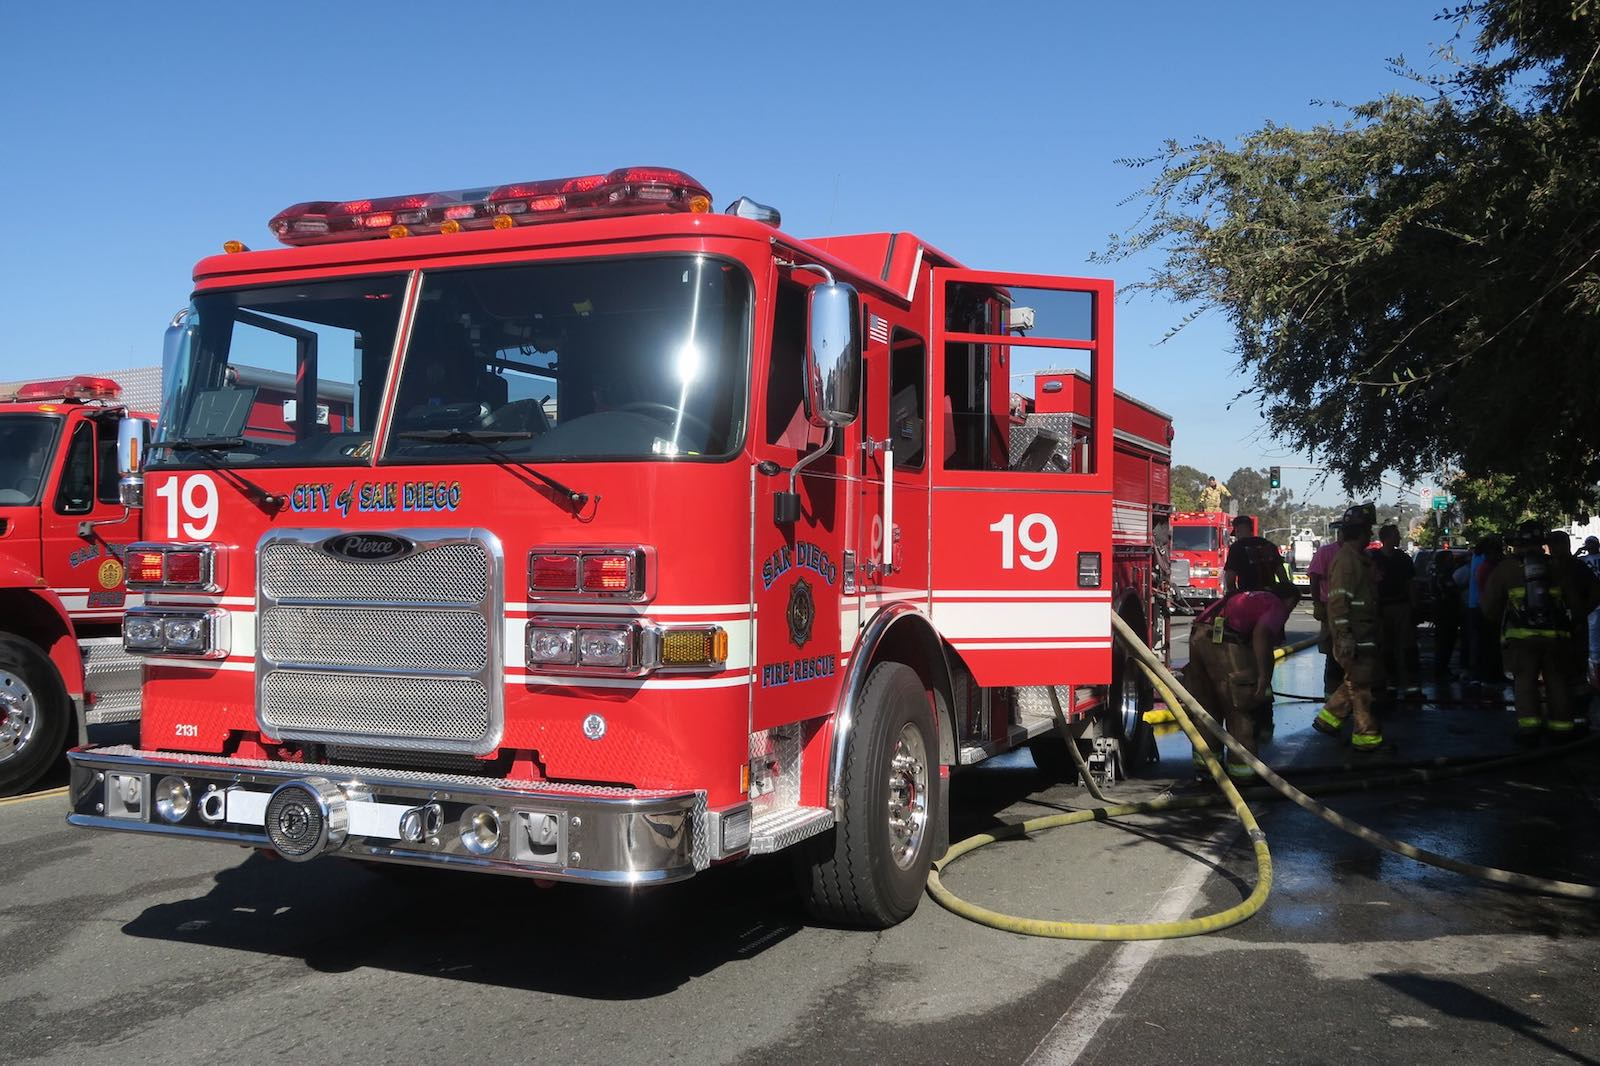 City of San Diego fire apparatus